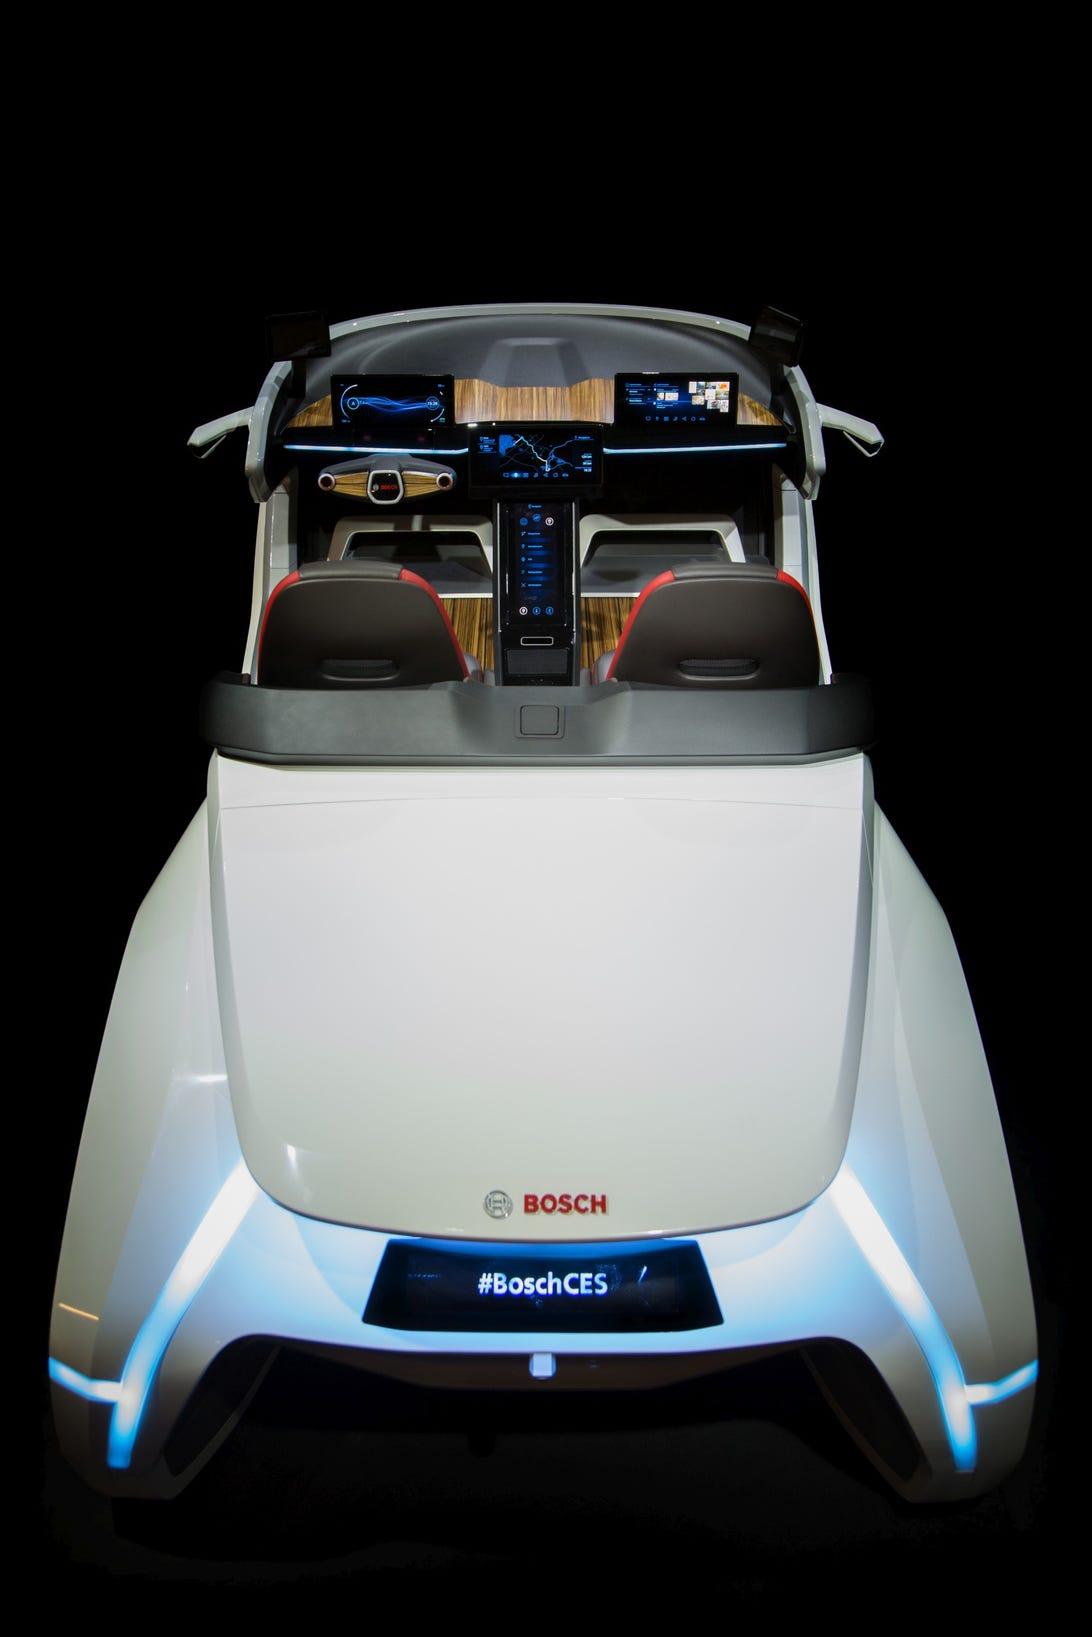 Bosch CES 2017 Concept Car